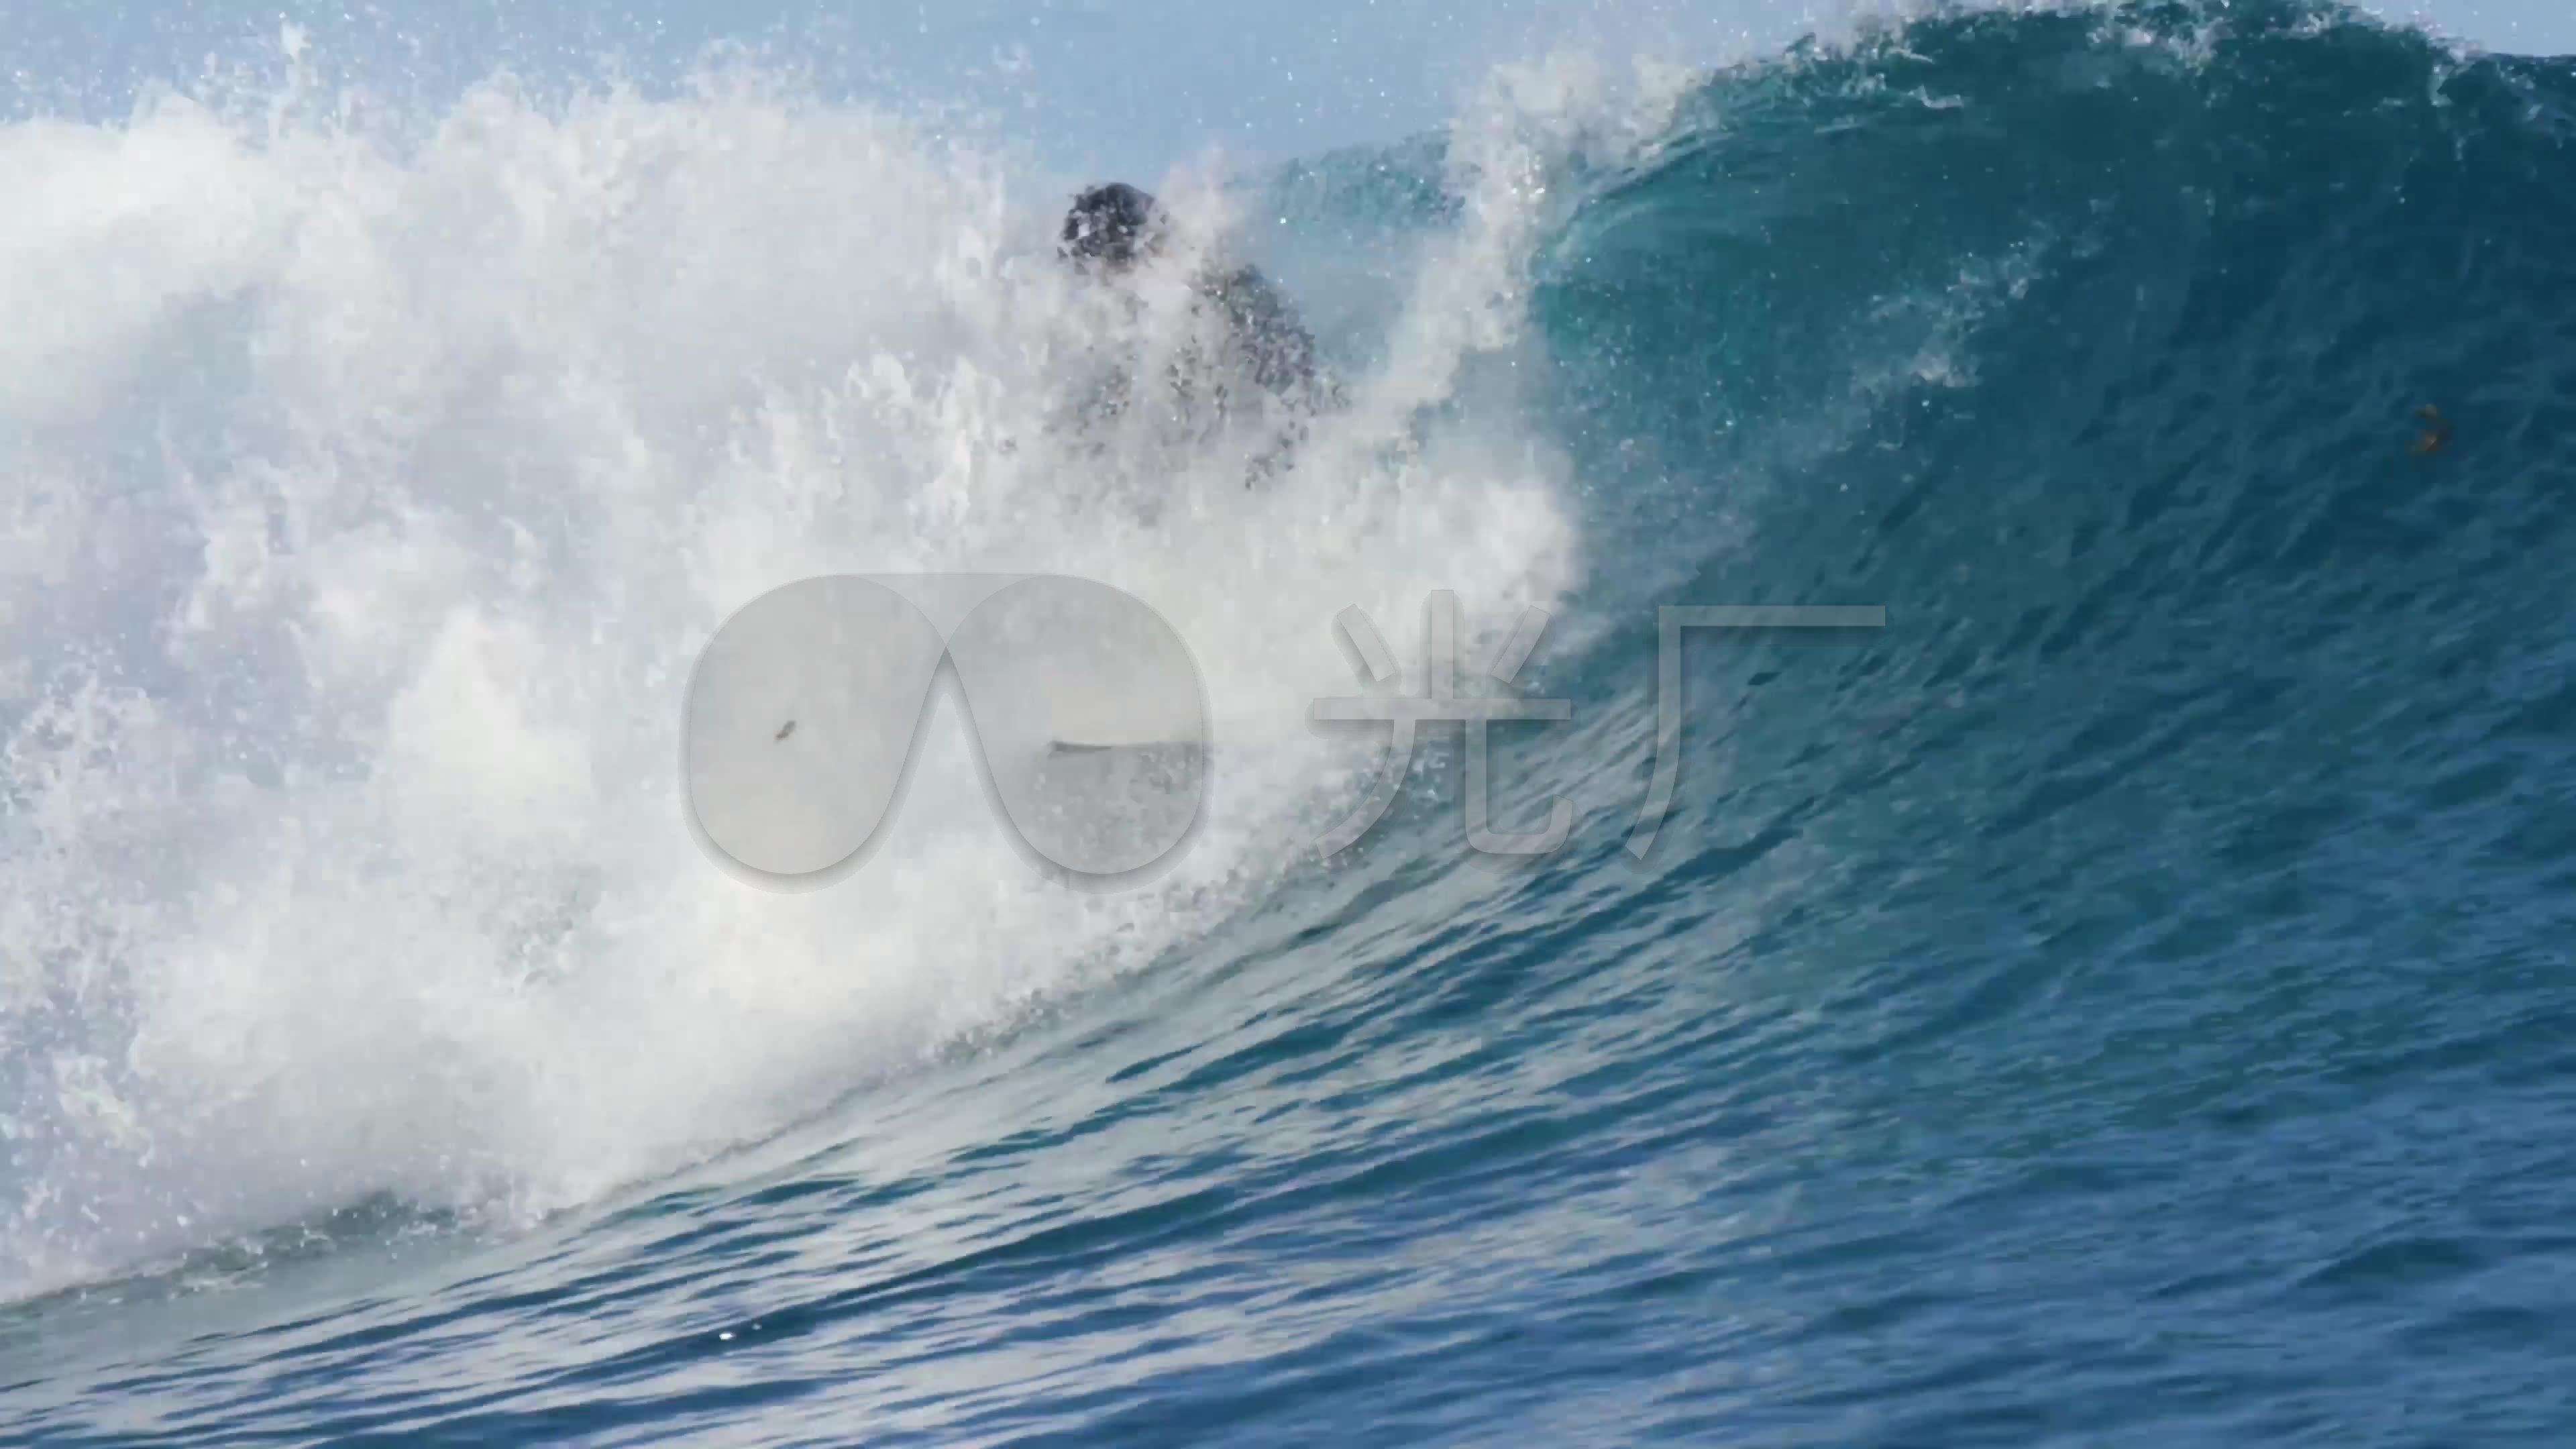 v高清高清山地滑板冲浪4K_3840X2160_视频视臂摩托麒麟图片